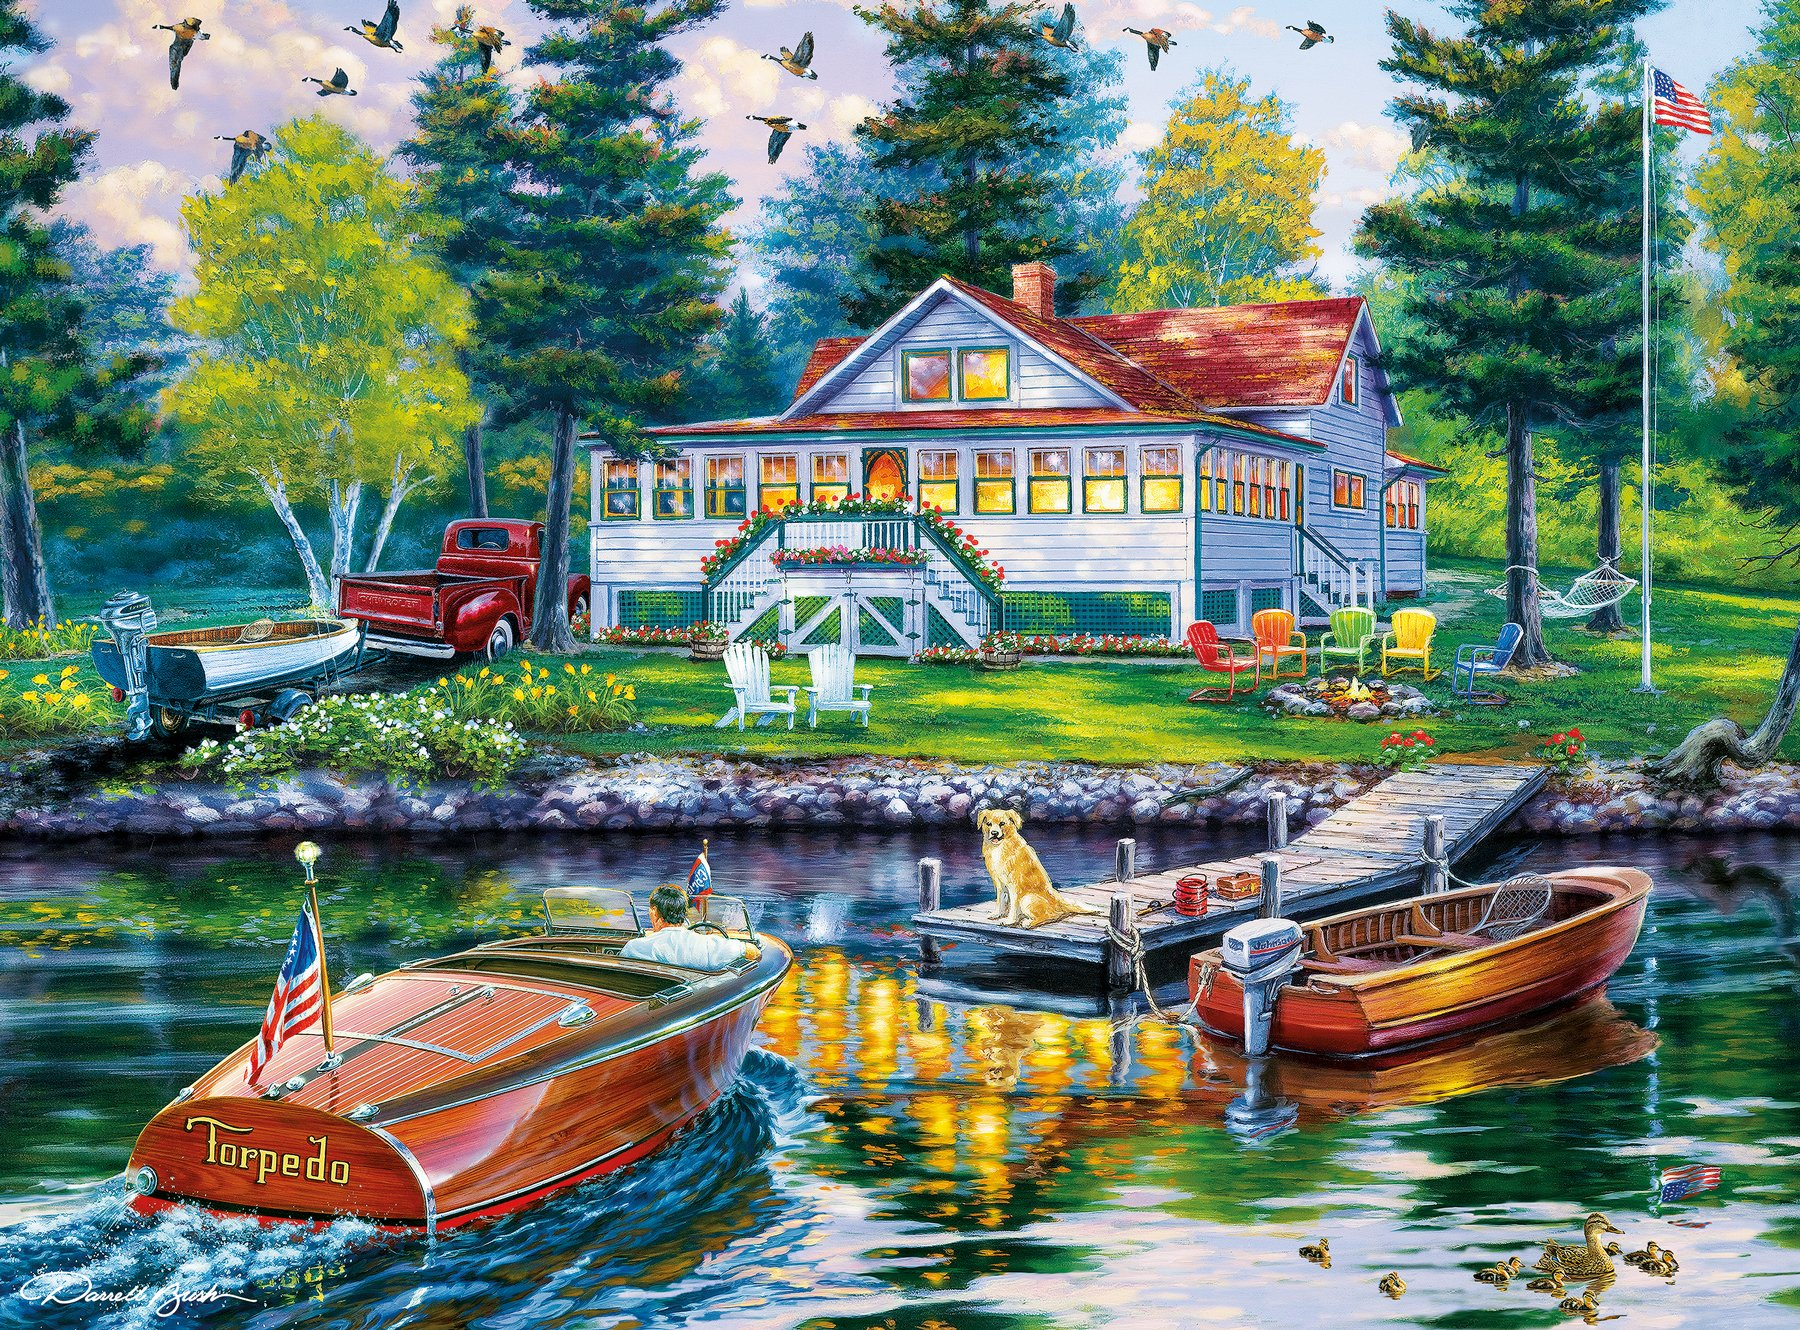 Buffalo Games - Darrell Bush - Cottage Retreat - 1000 Piece Jigsaw Puzzle